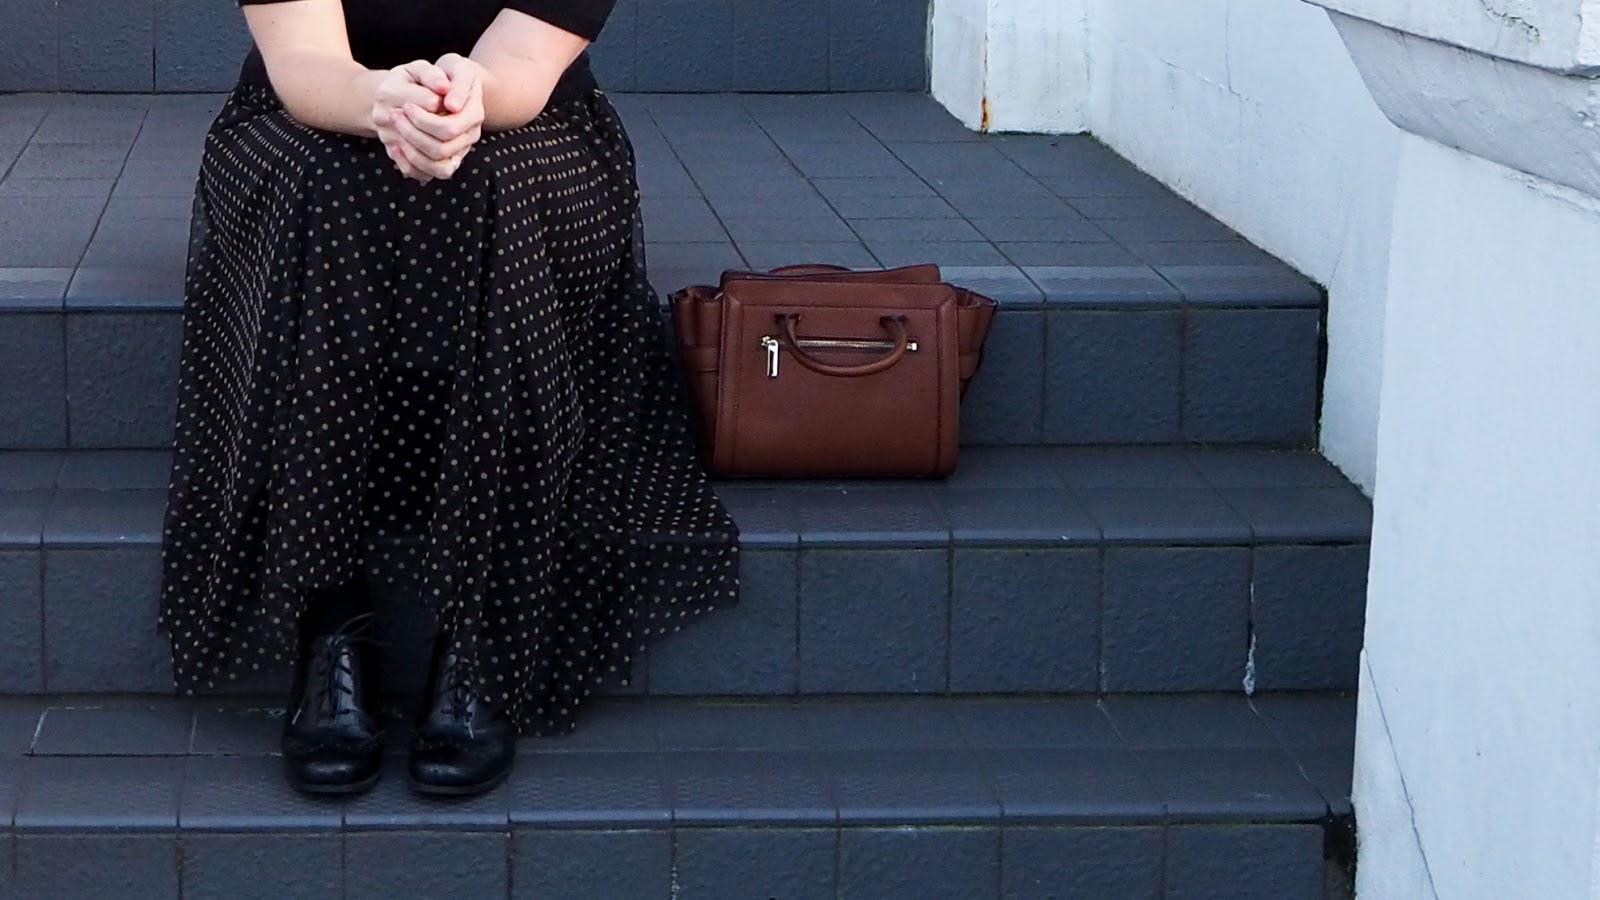 Black Mesh Tulle Skirt with tan flocked swiss dot pattern